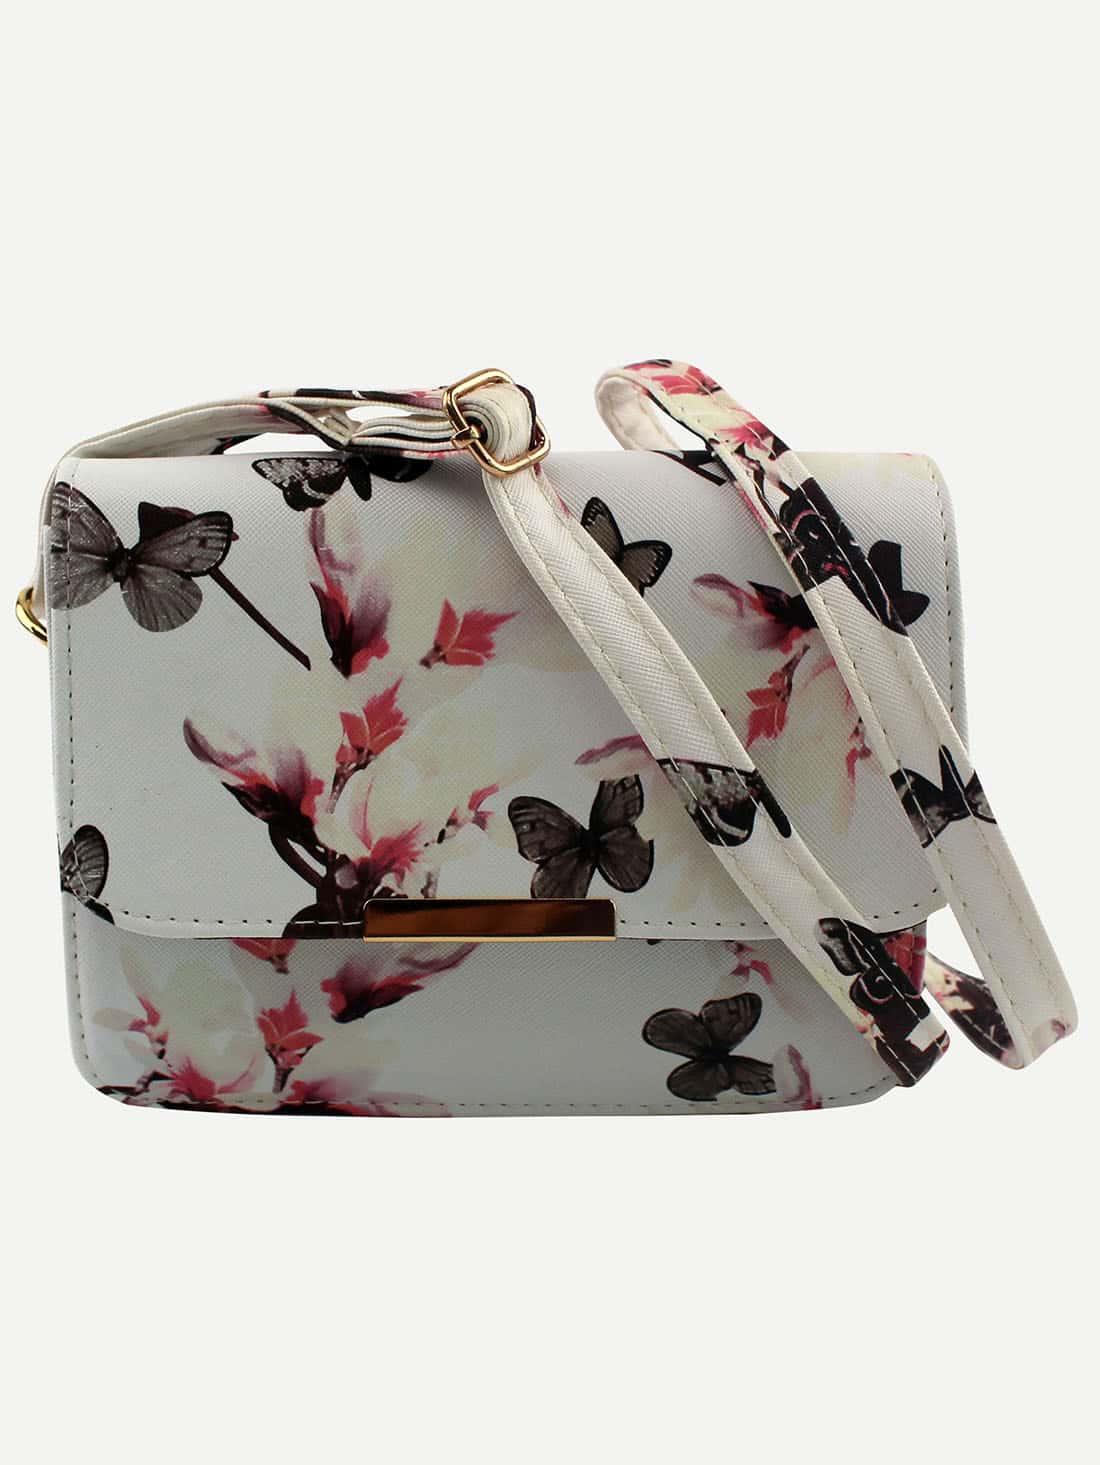 Flower & Butterfly Print Flap Bag - White